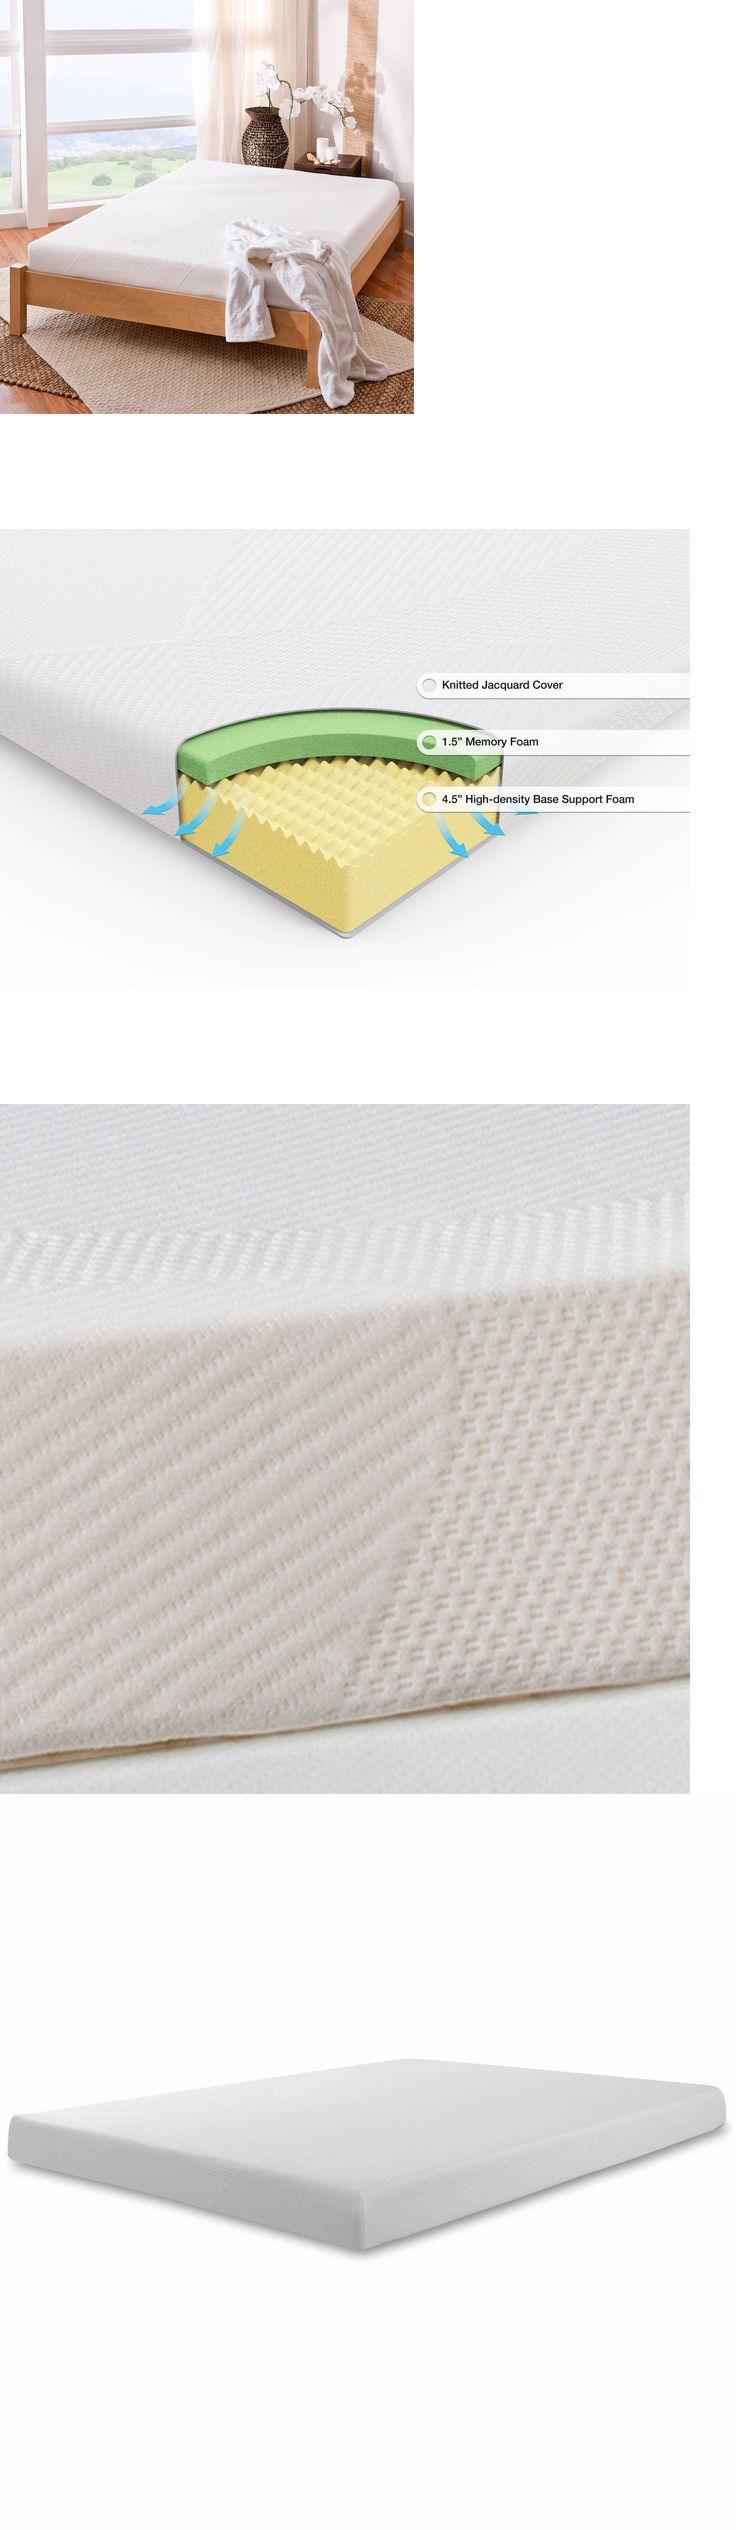 Mattresses 131588: 6 Inch Memory Foam Mattress Full Size Bed Cool Firm  Sleep New Spa